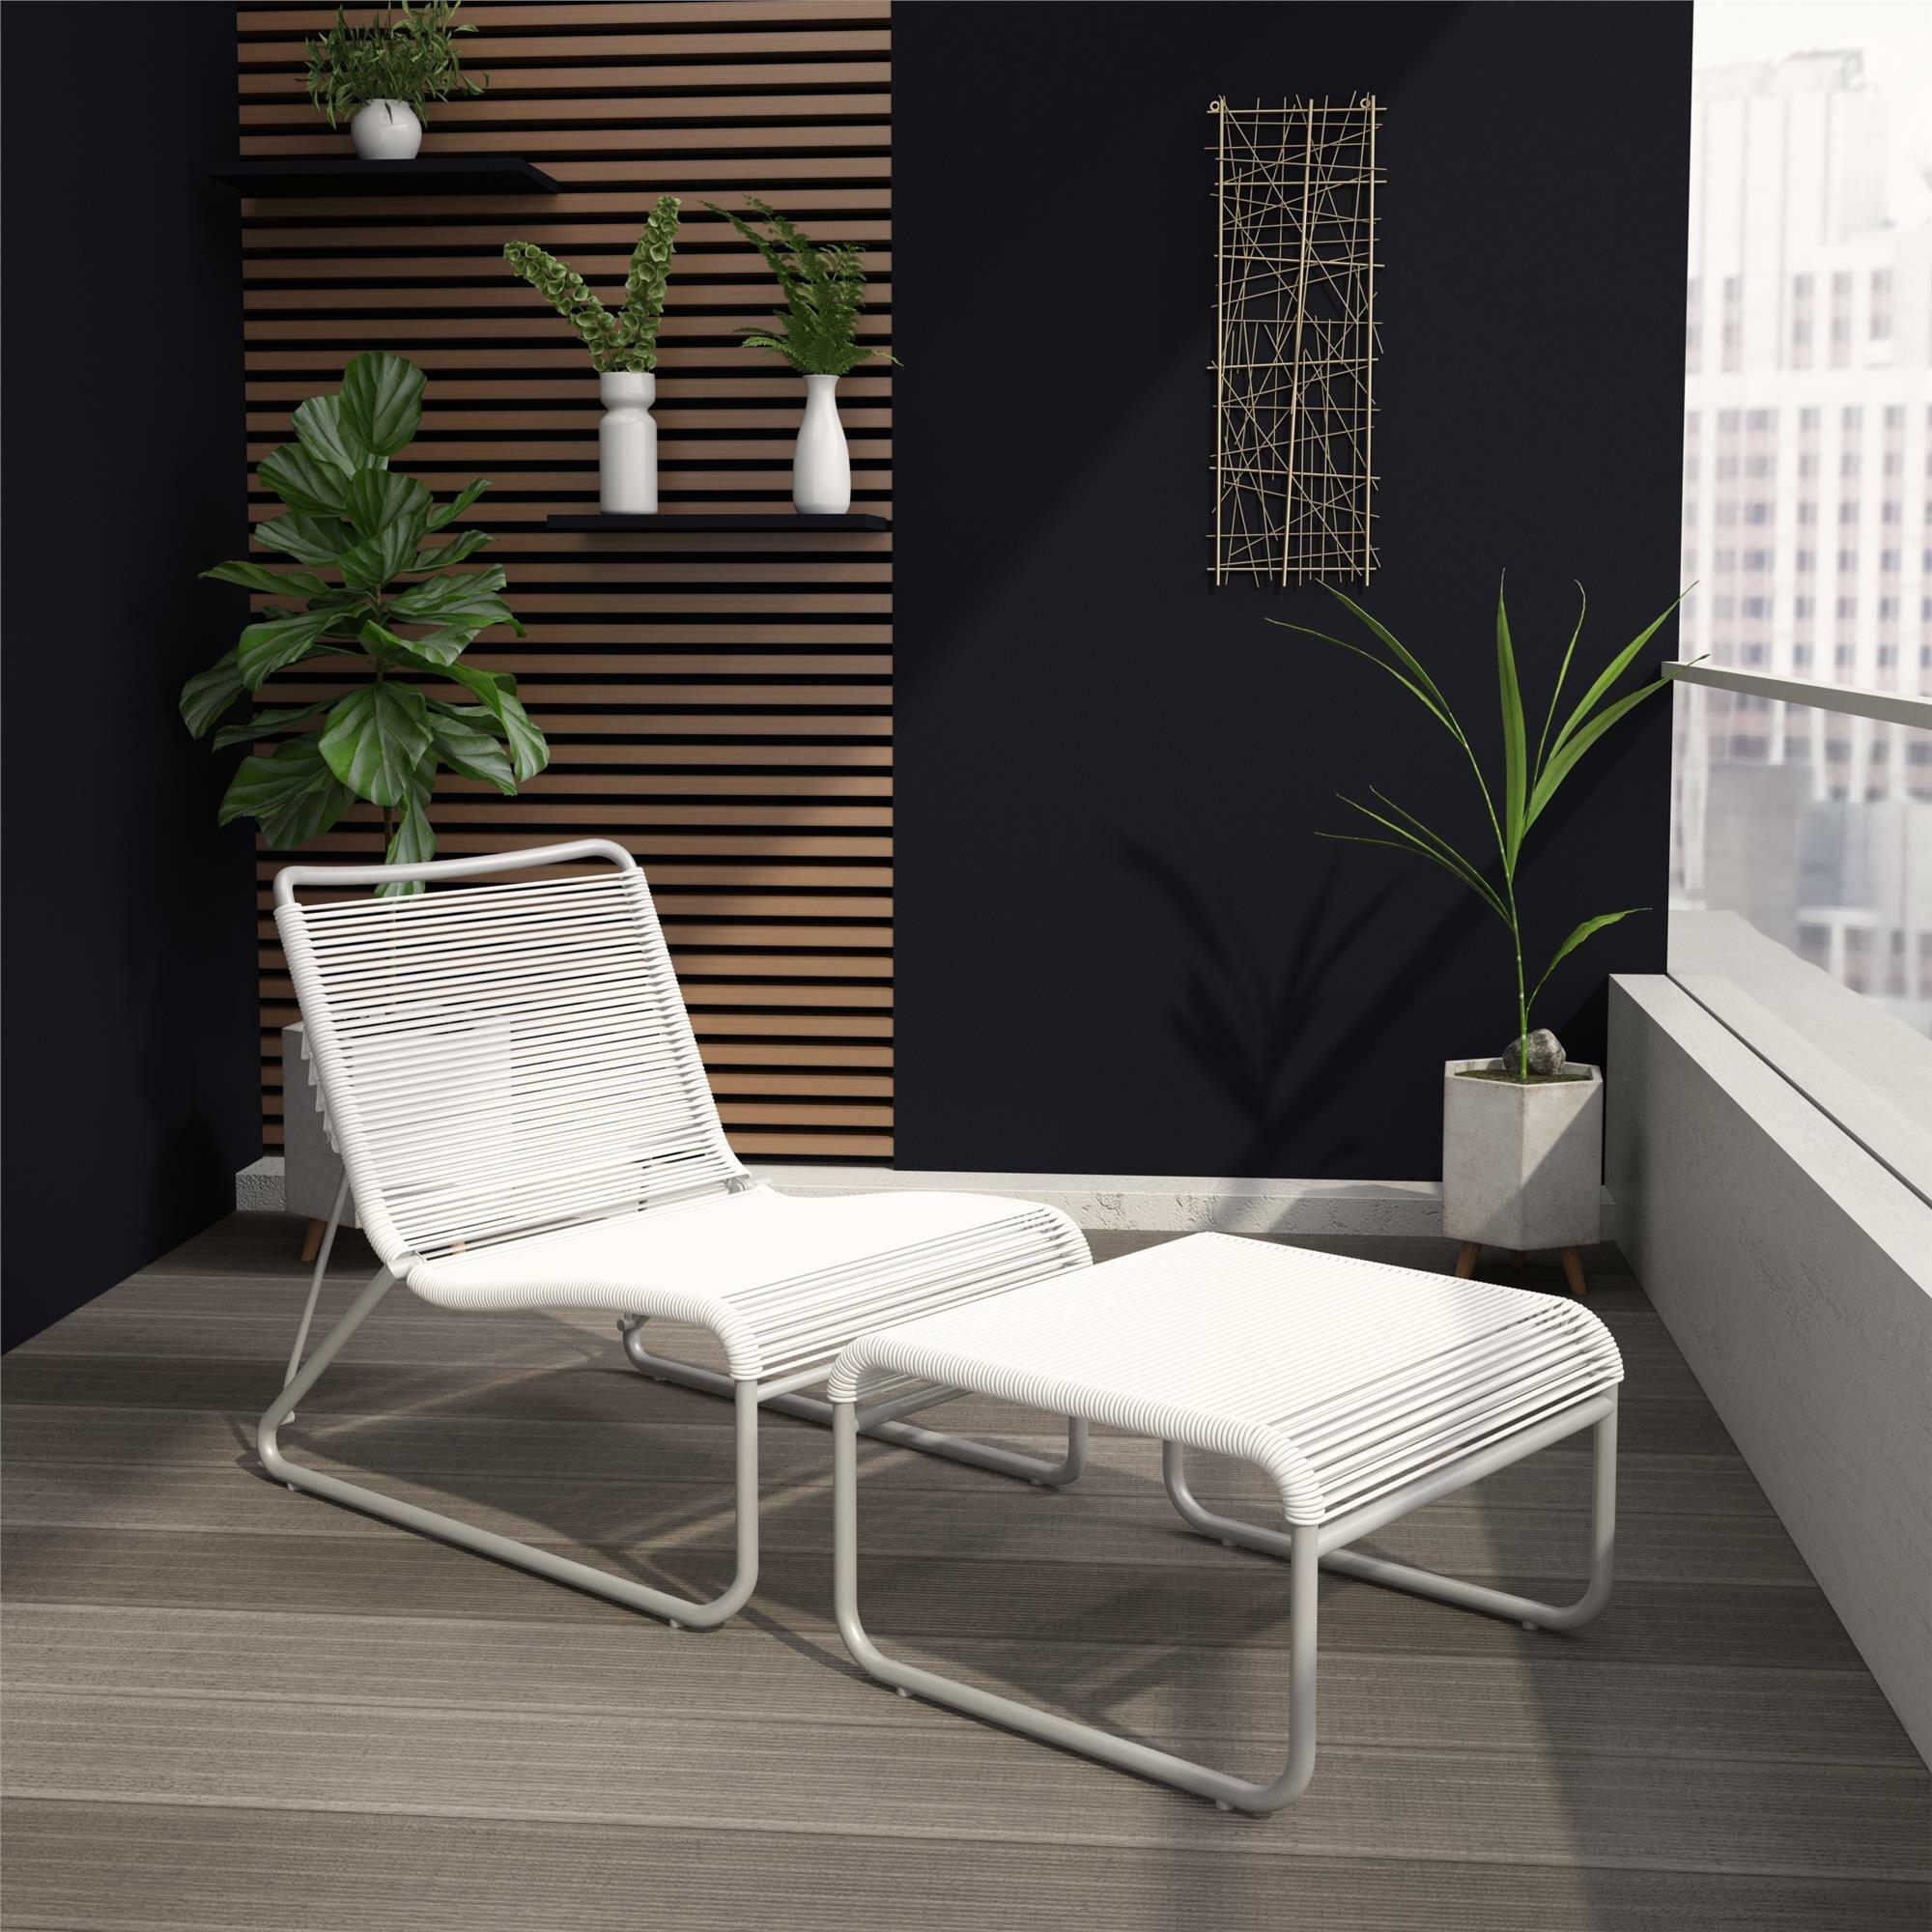 Cosmopolitan Lita Recliner Patio Chair